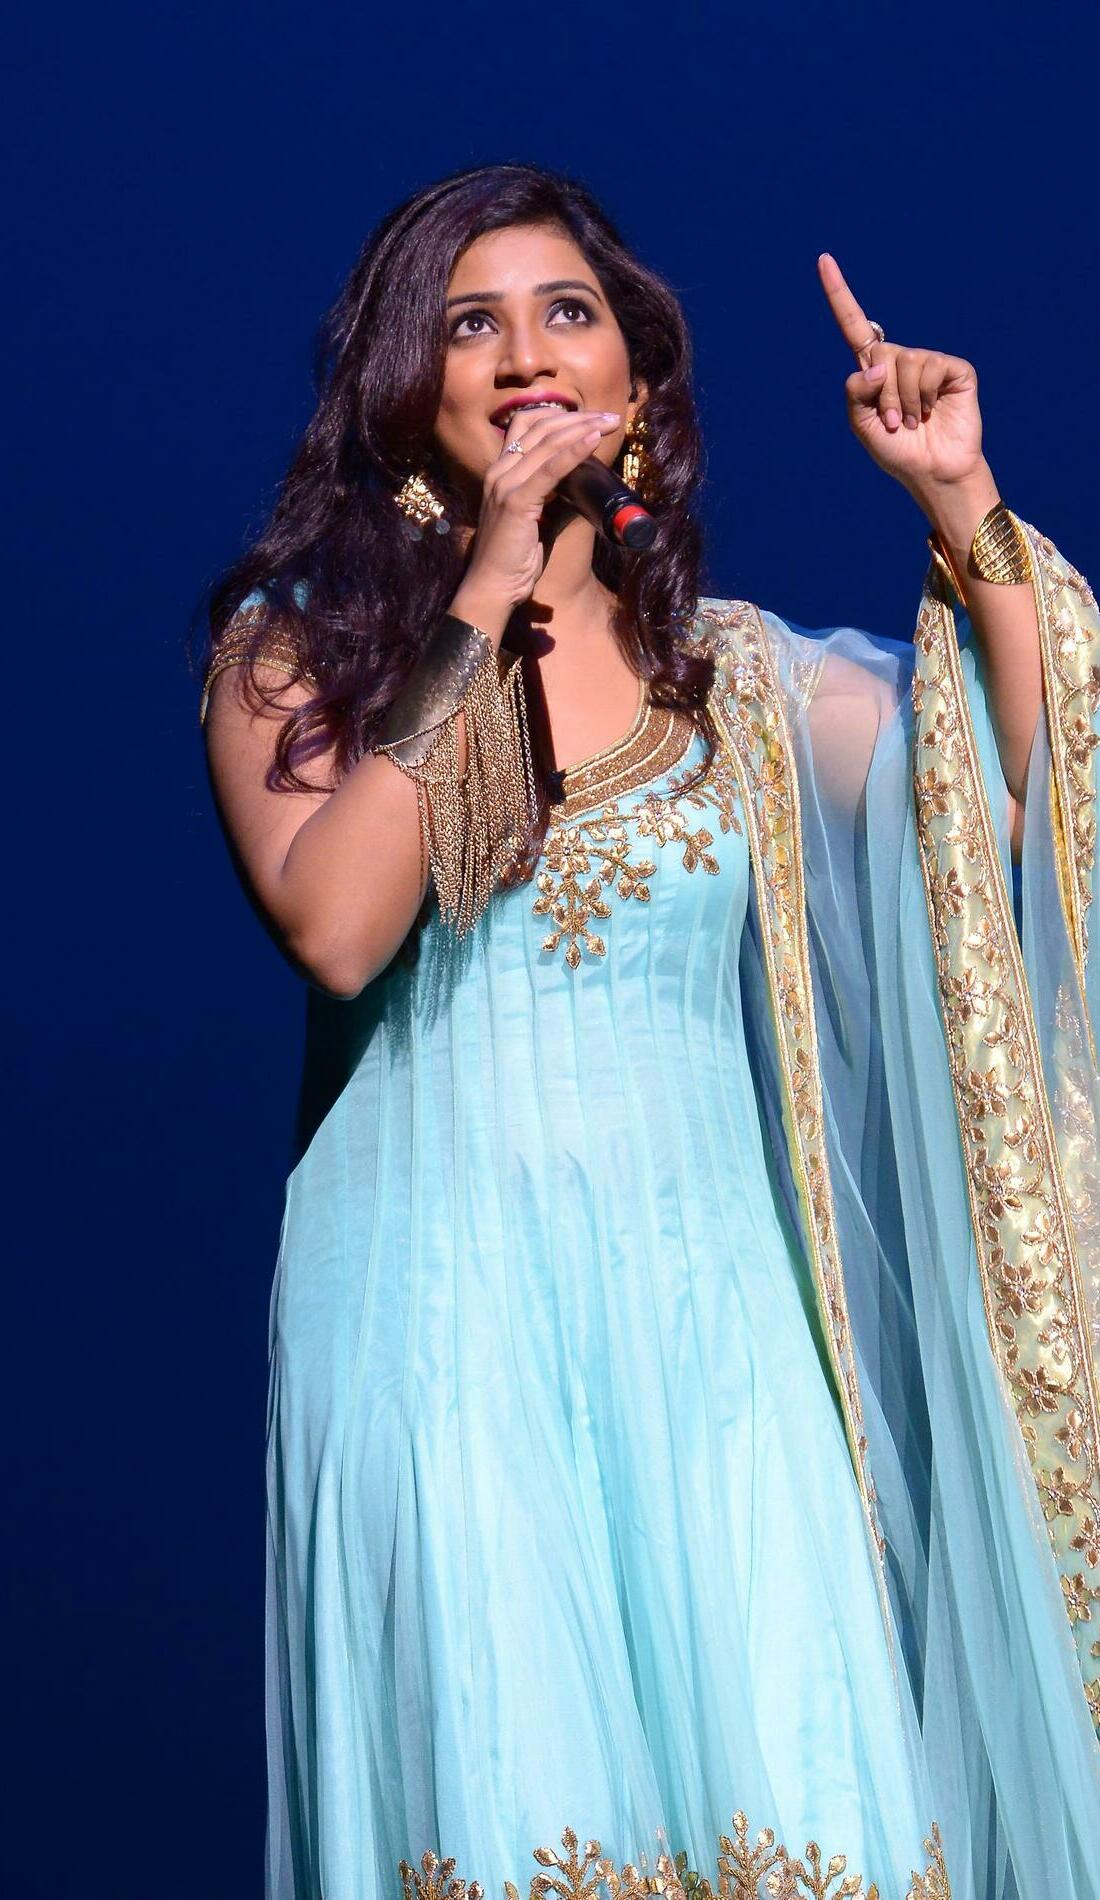 A Shreya Ghoshal live event